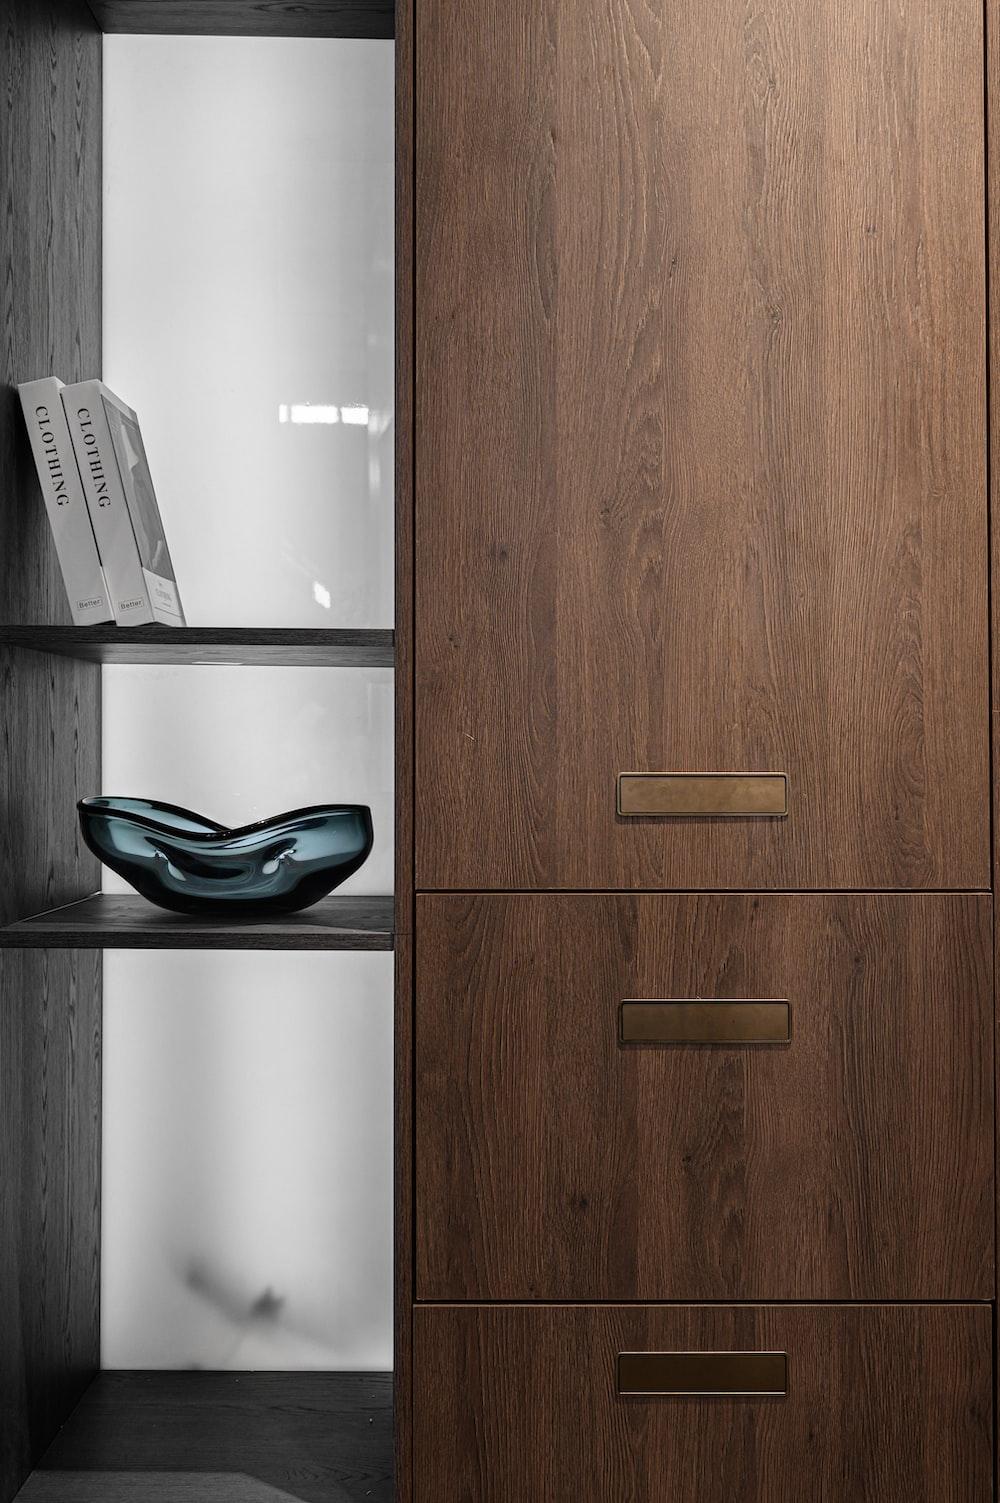 brown wooden cabinet beside white printer